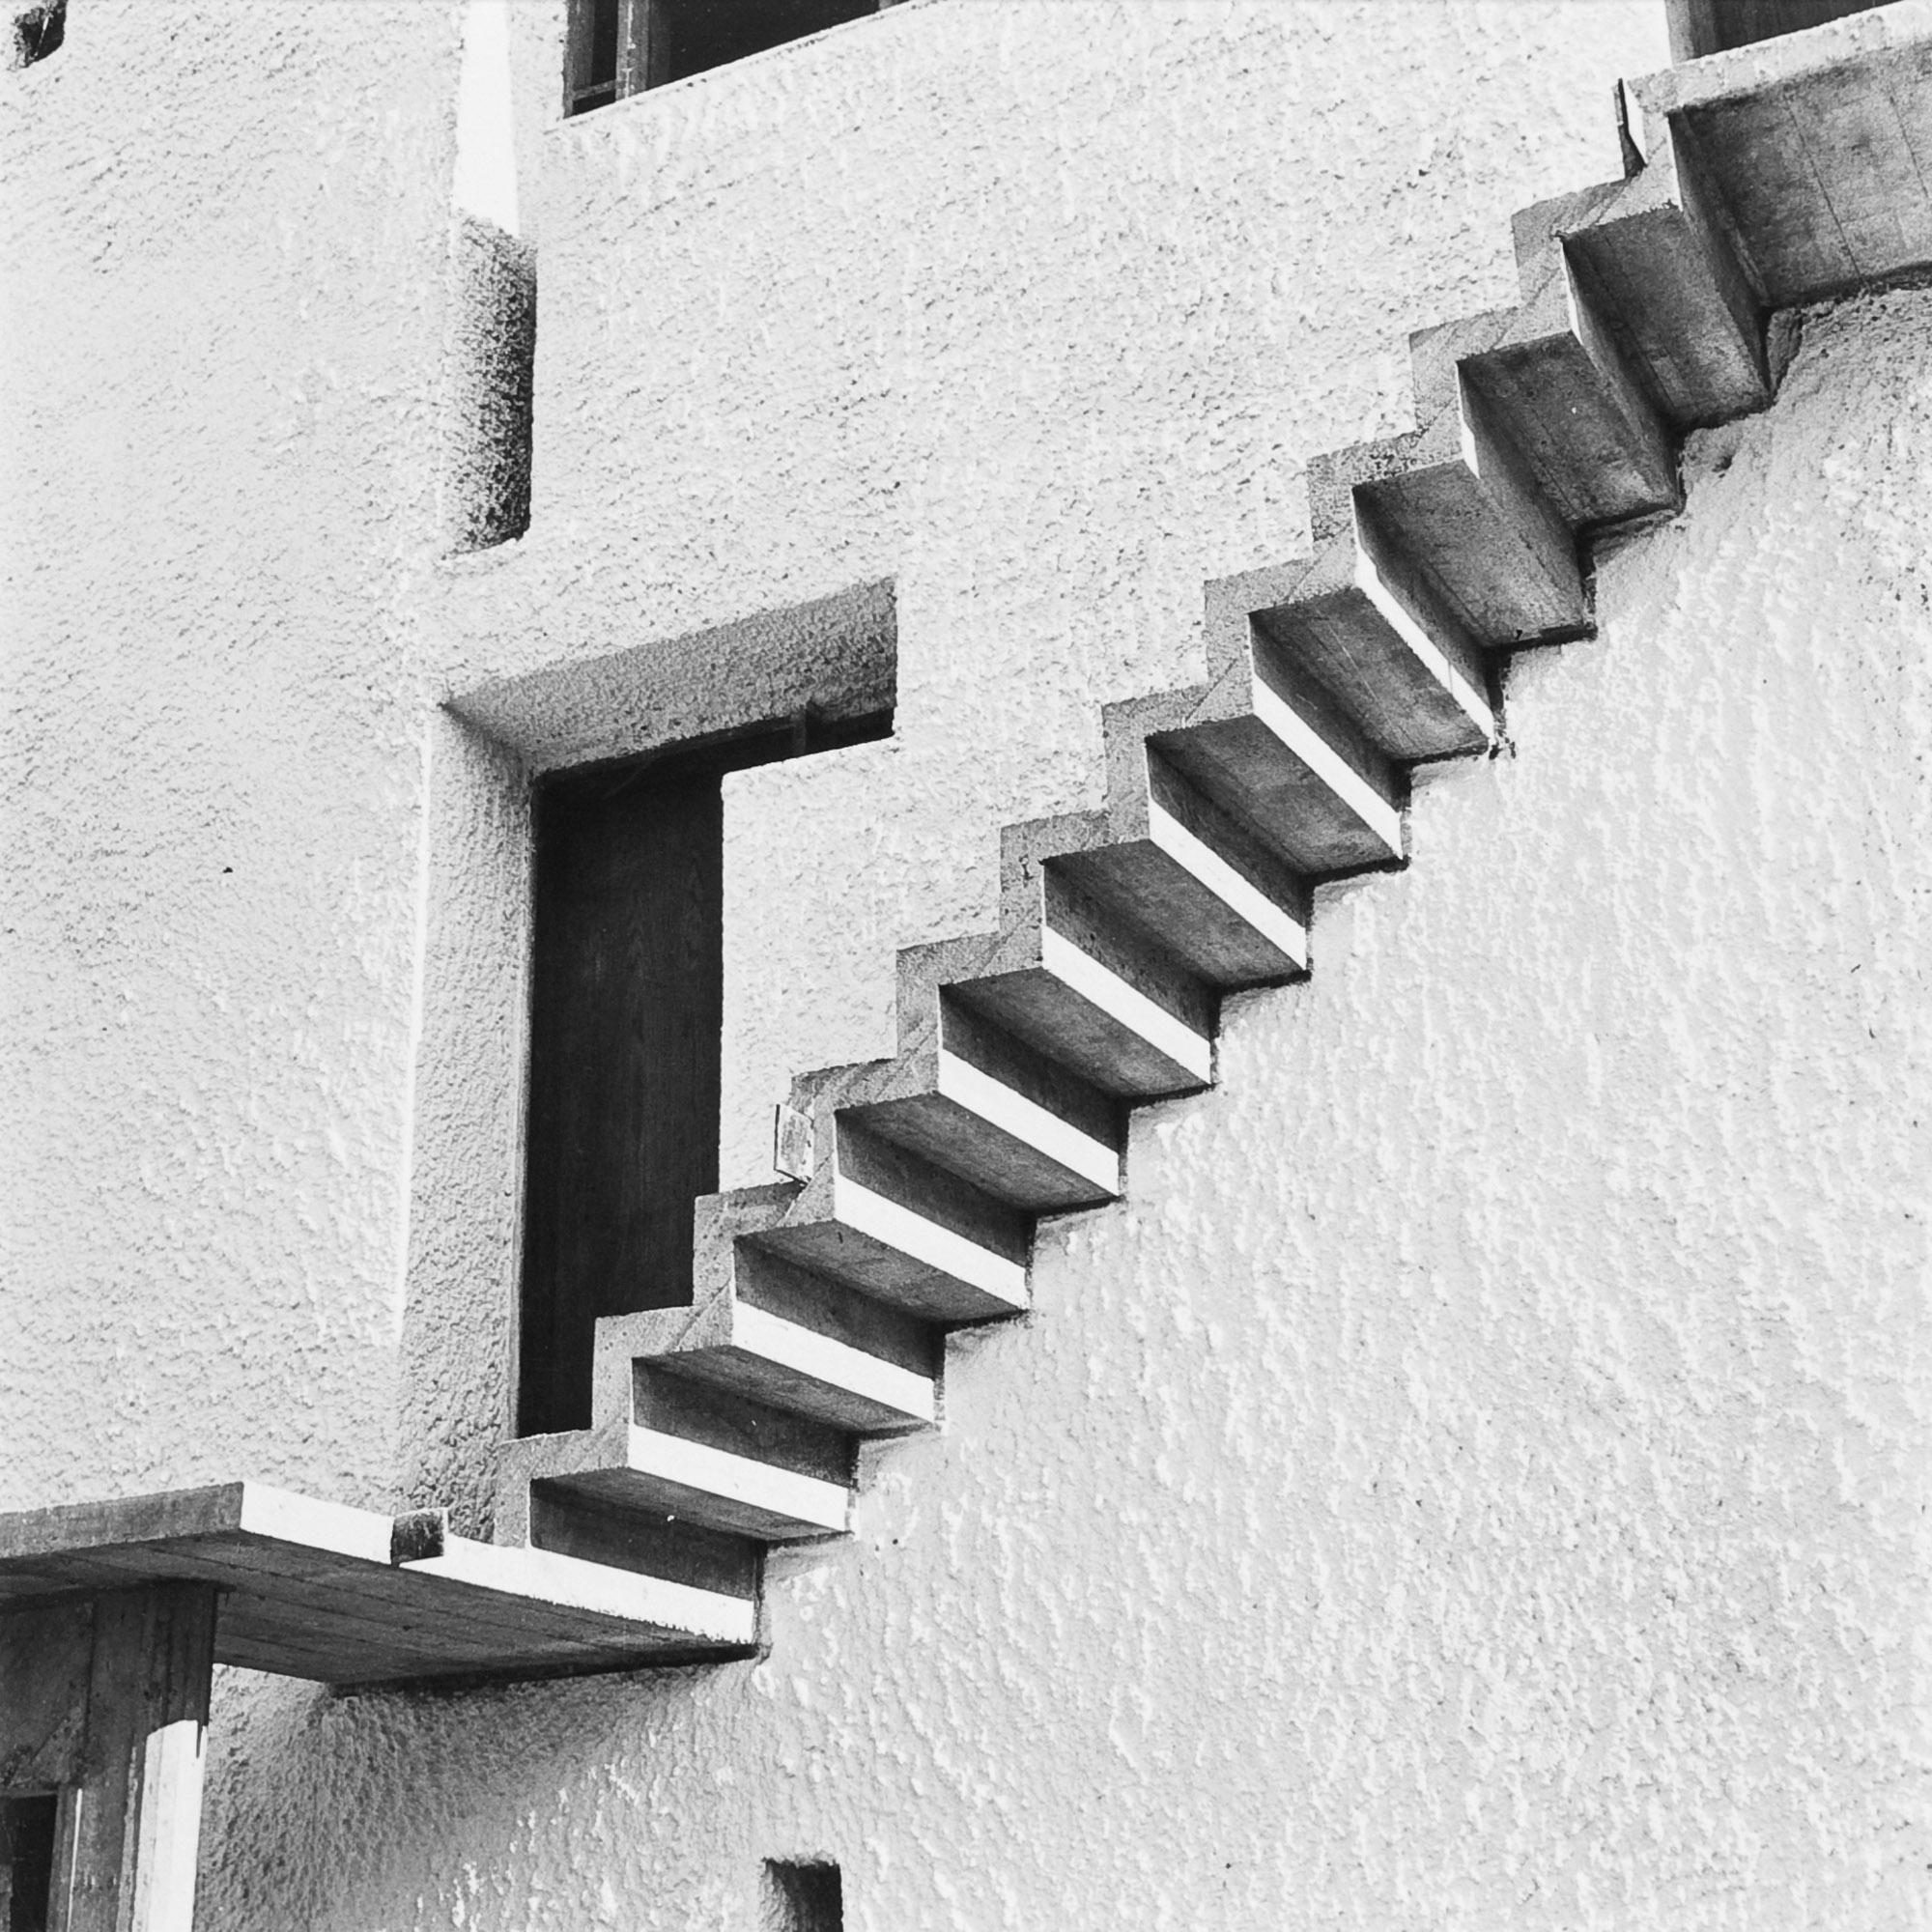 Ramp versus Staircase